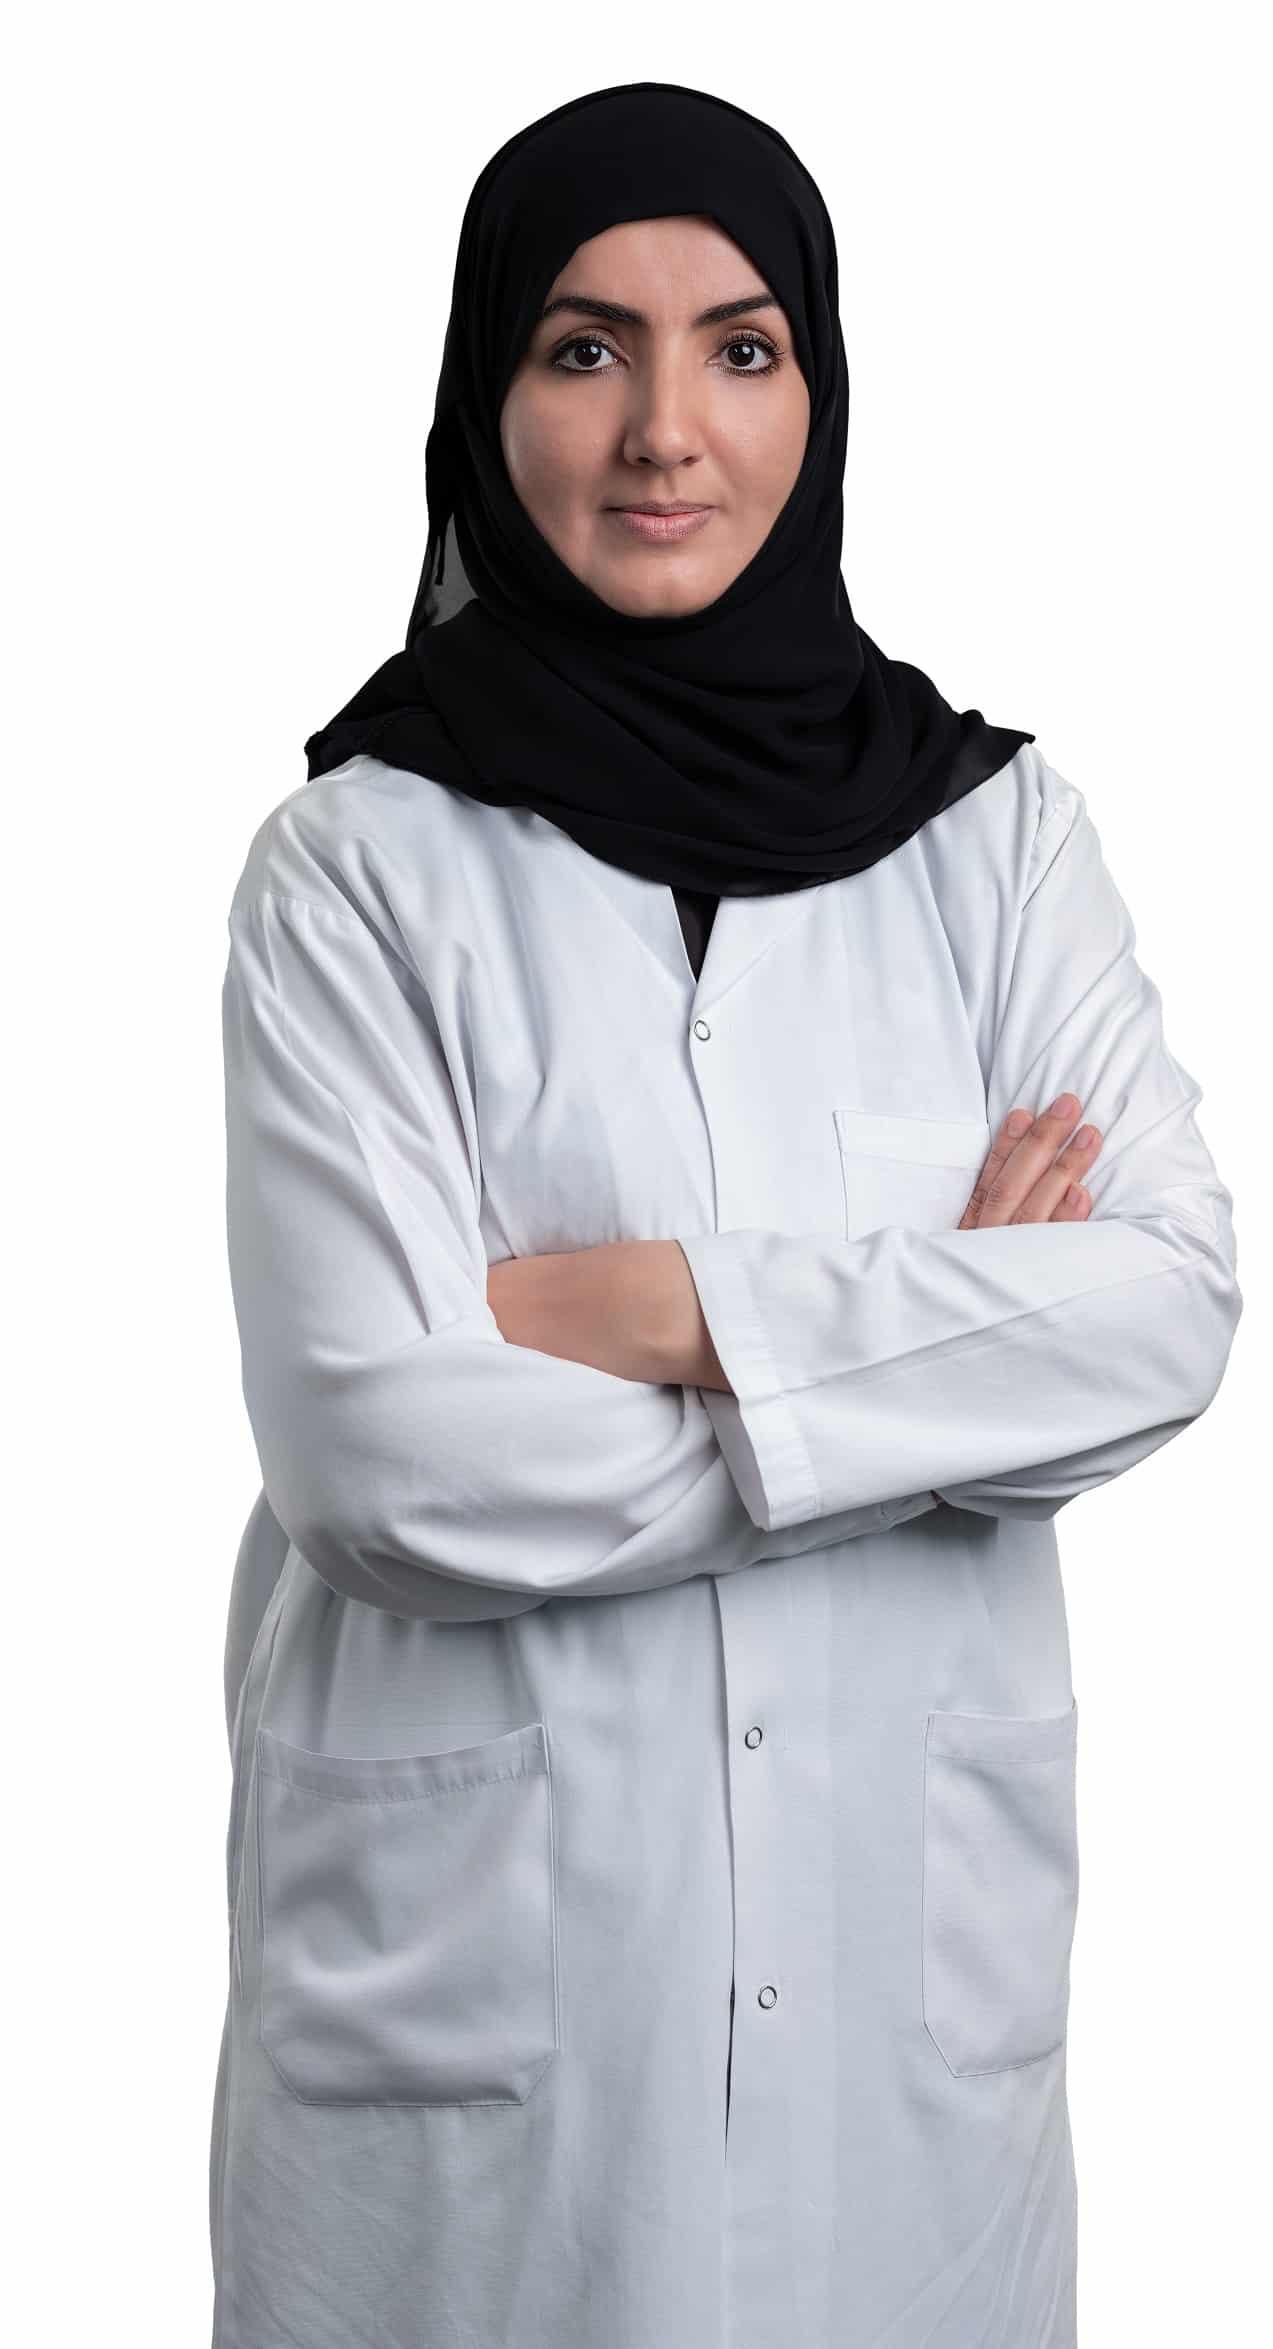 Dr. Mariam Nasir Alzaabi